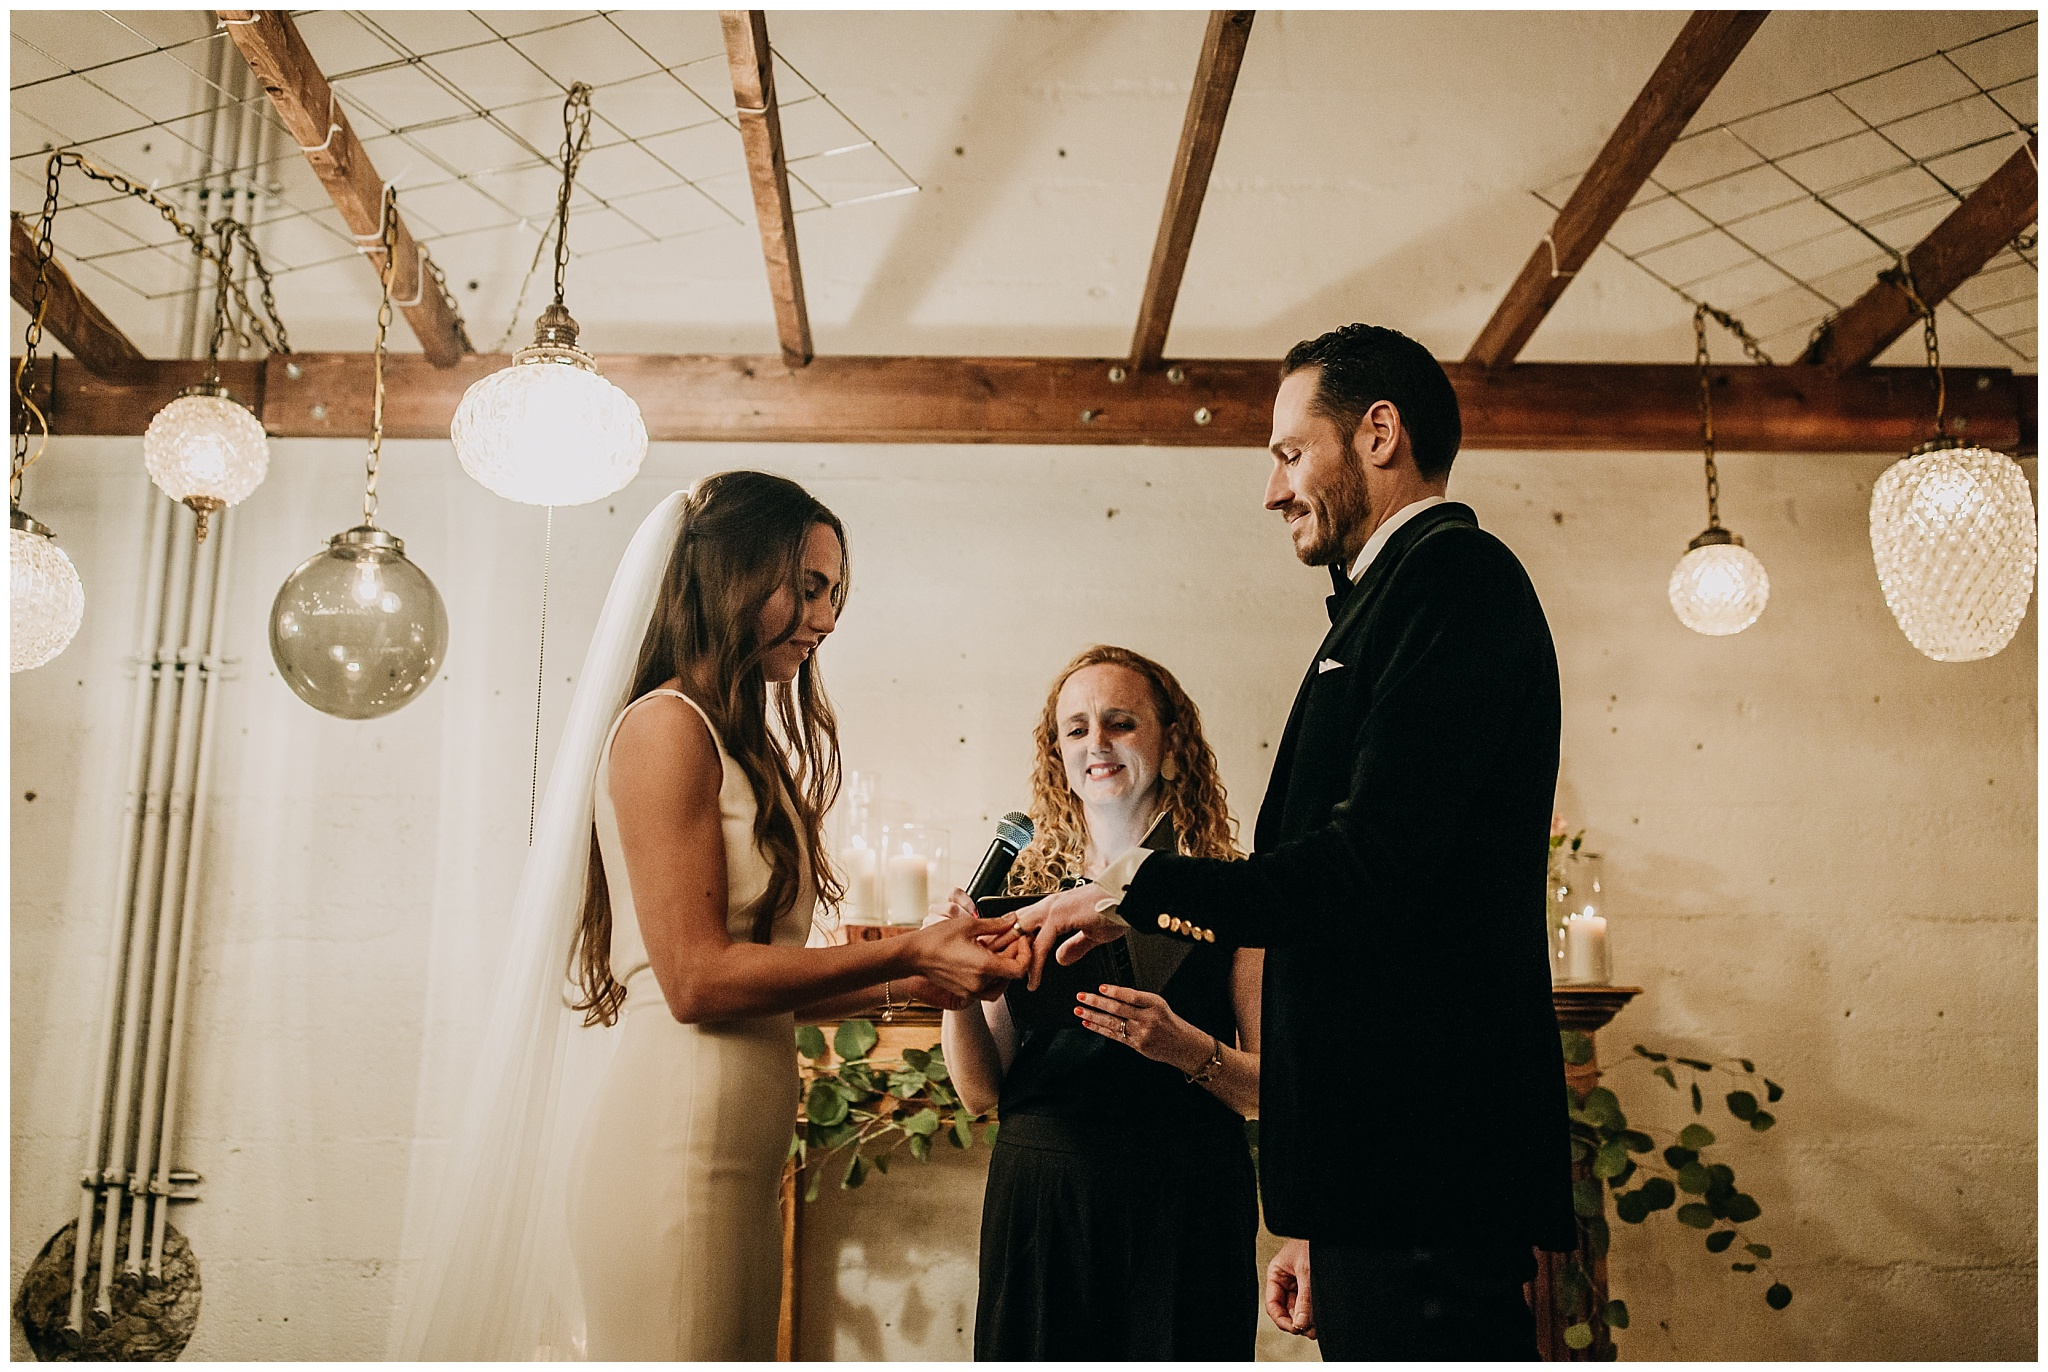 new-years-eve-settlement-building-wedding_0046.jpg